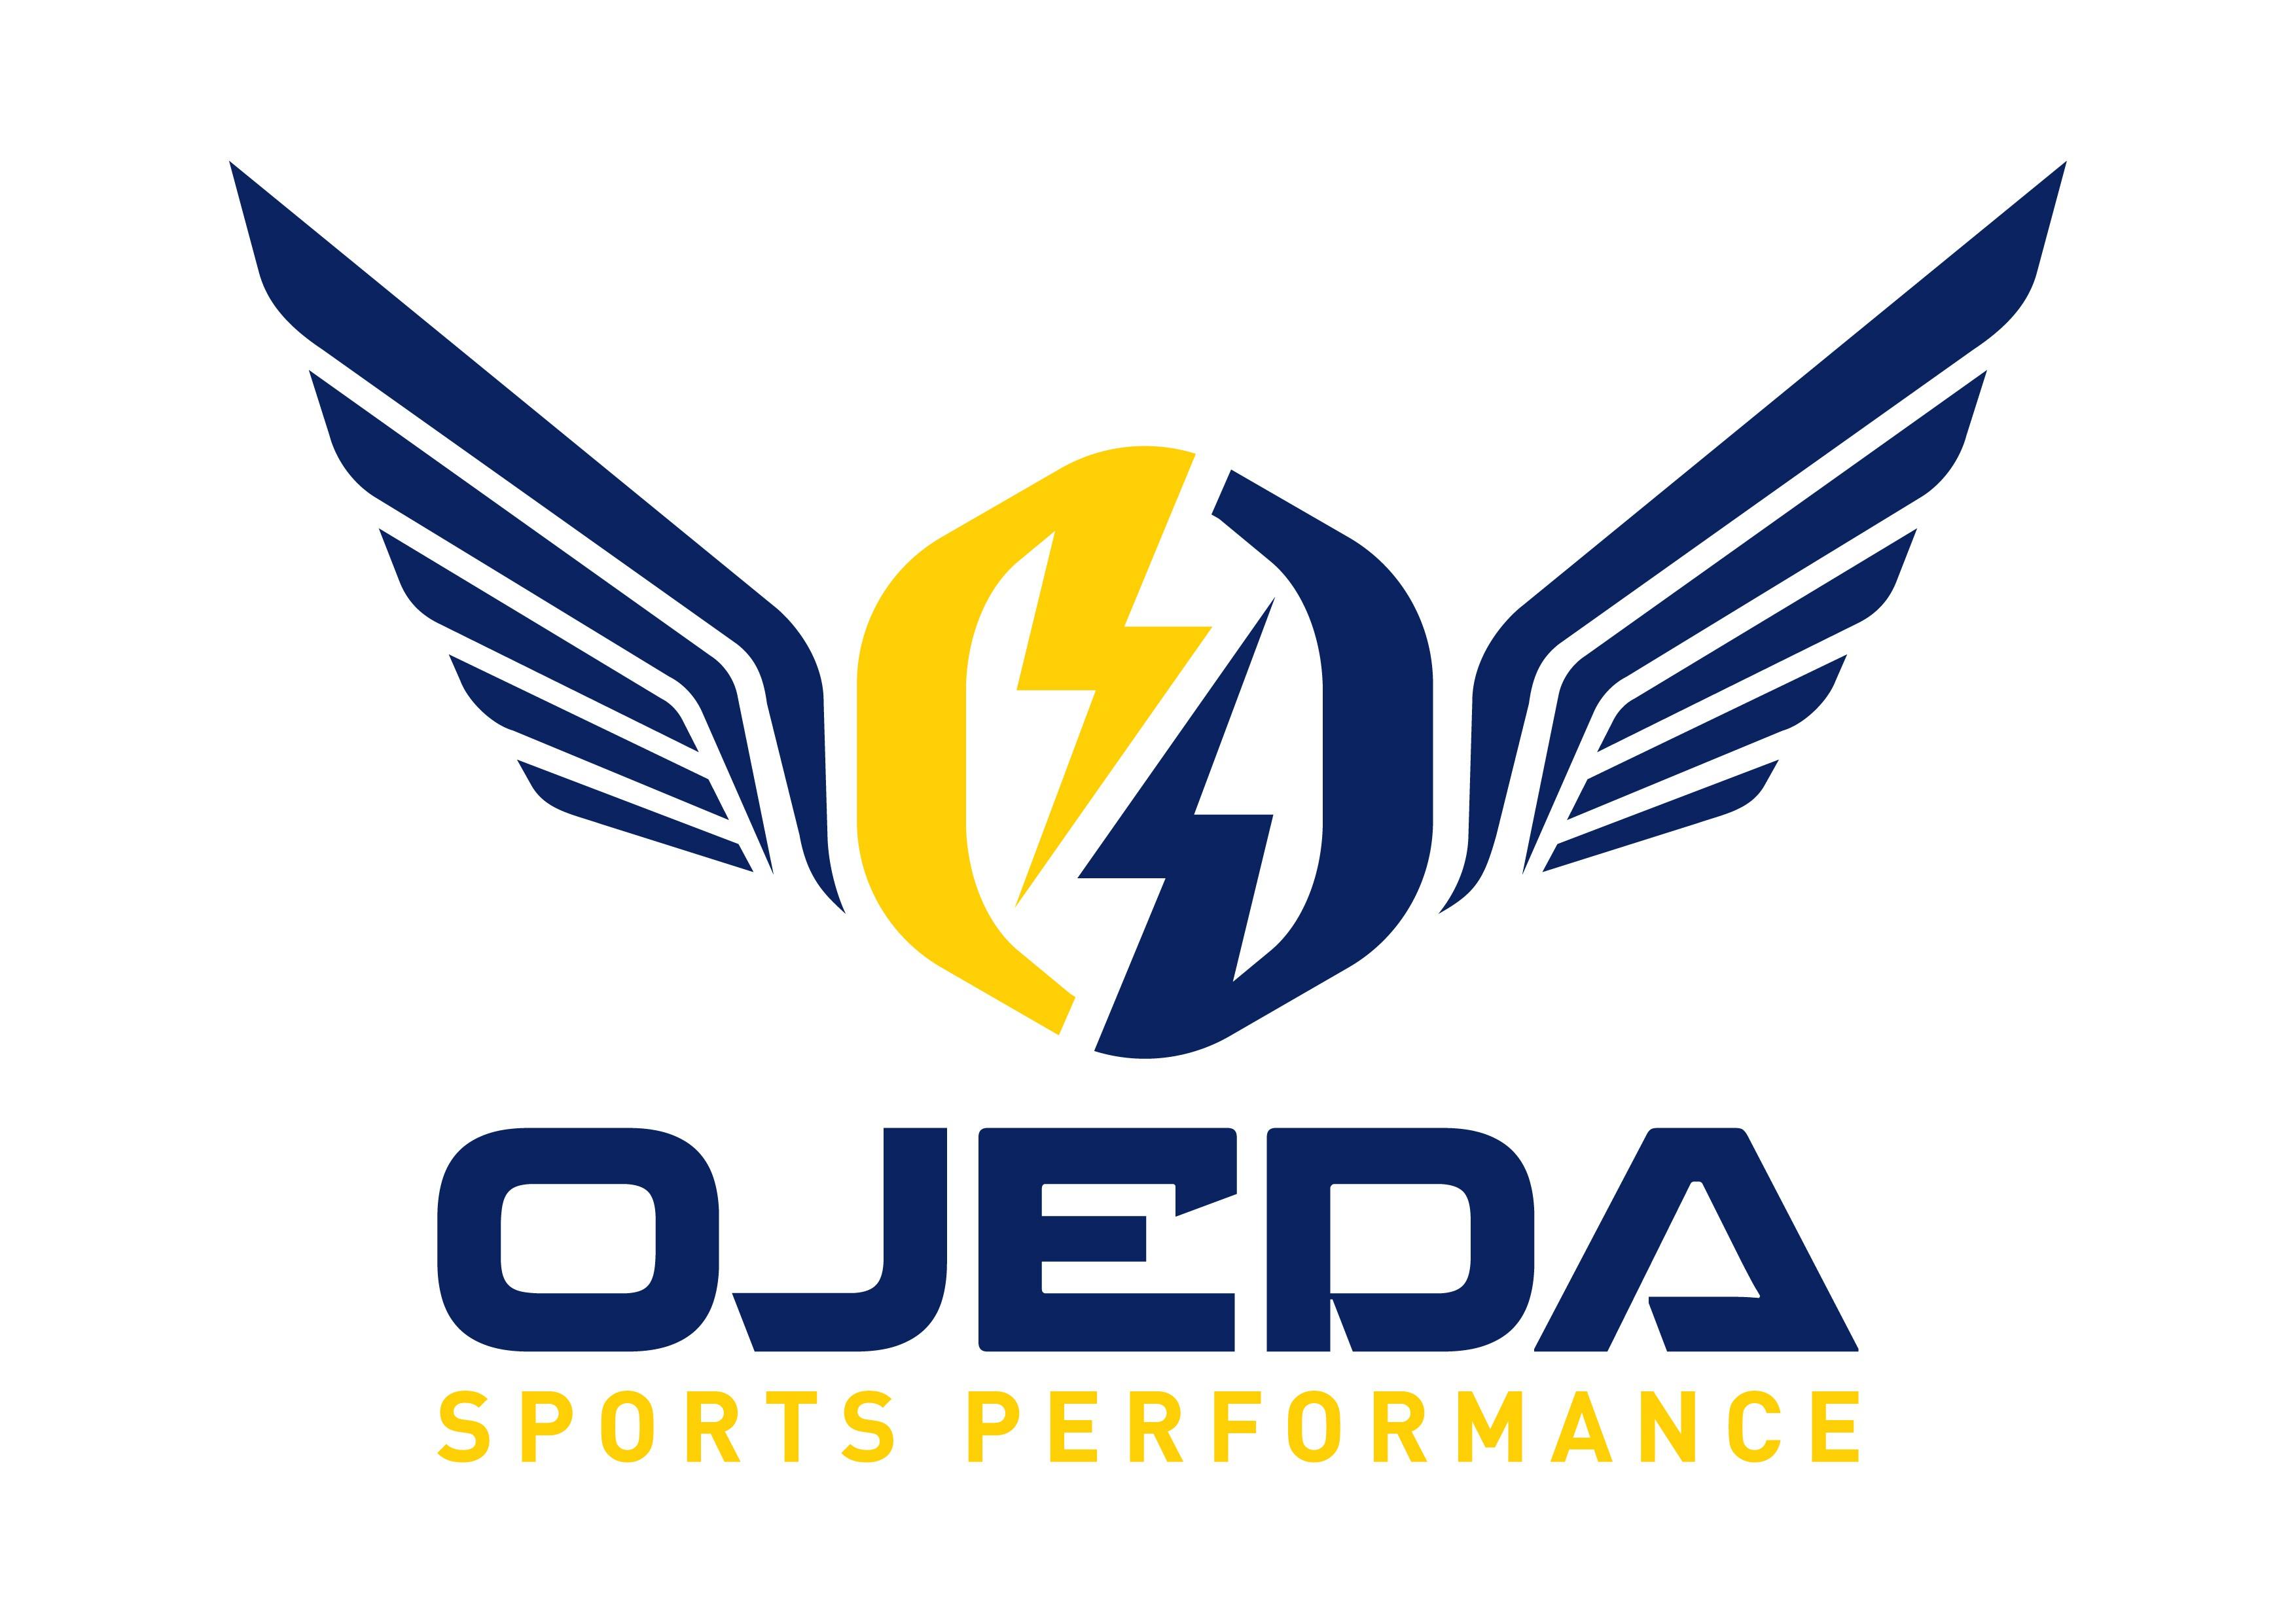 Create a distinguishing Brand logo for Ojeda Sports Performance